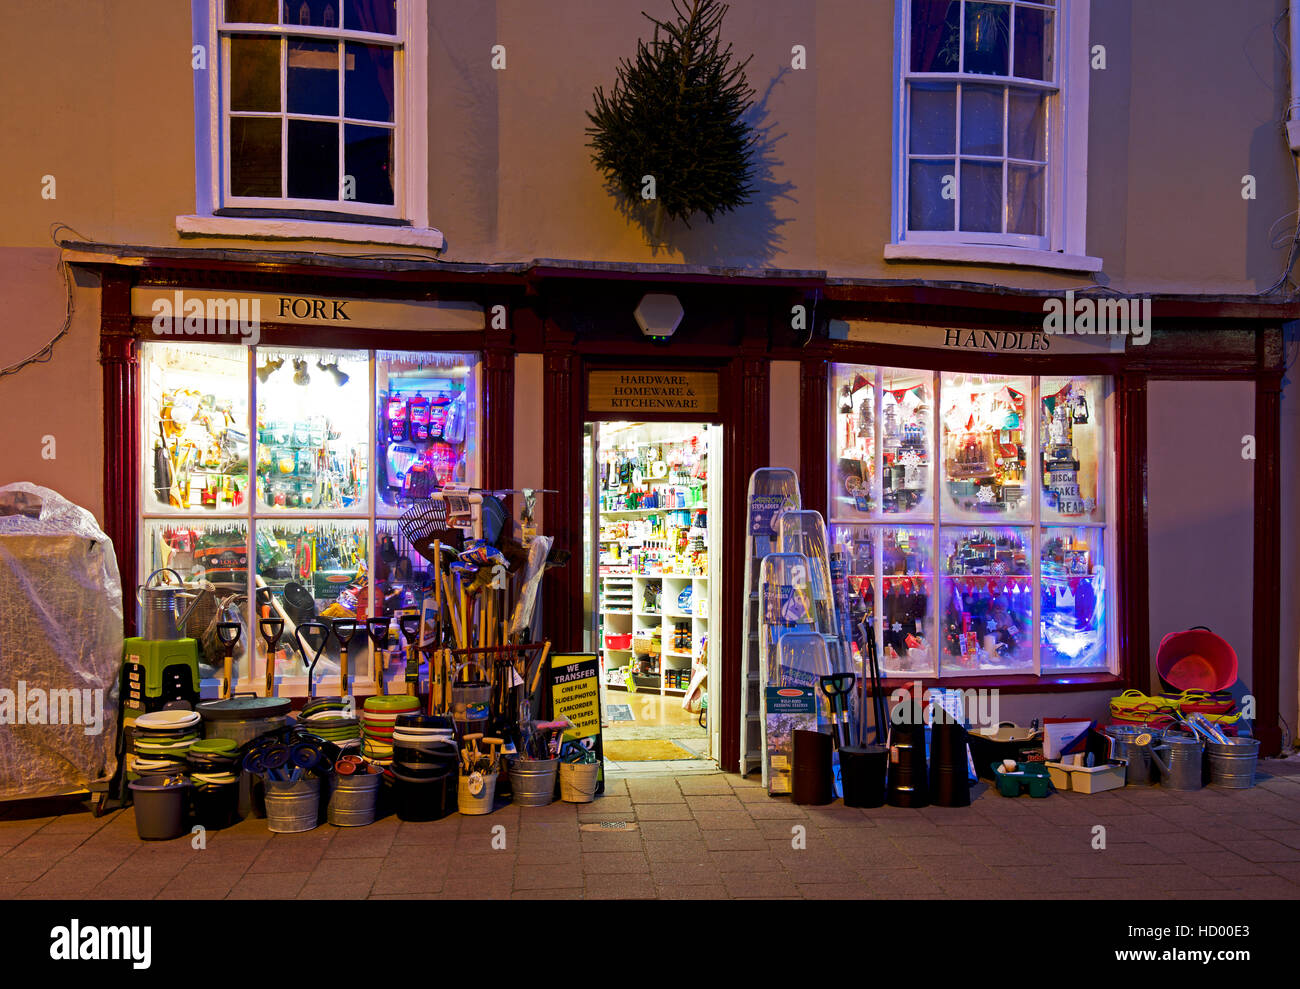 Hardware shop - Fork Handles - in Teignmouth at dusk, Devon, England ...